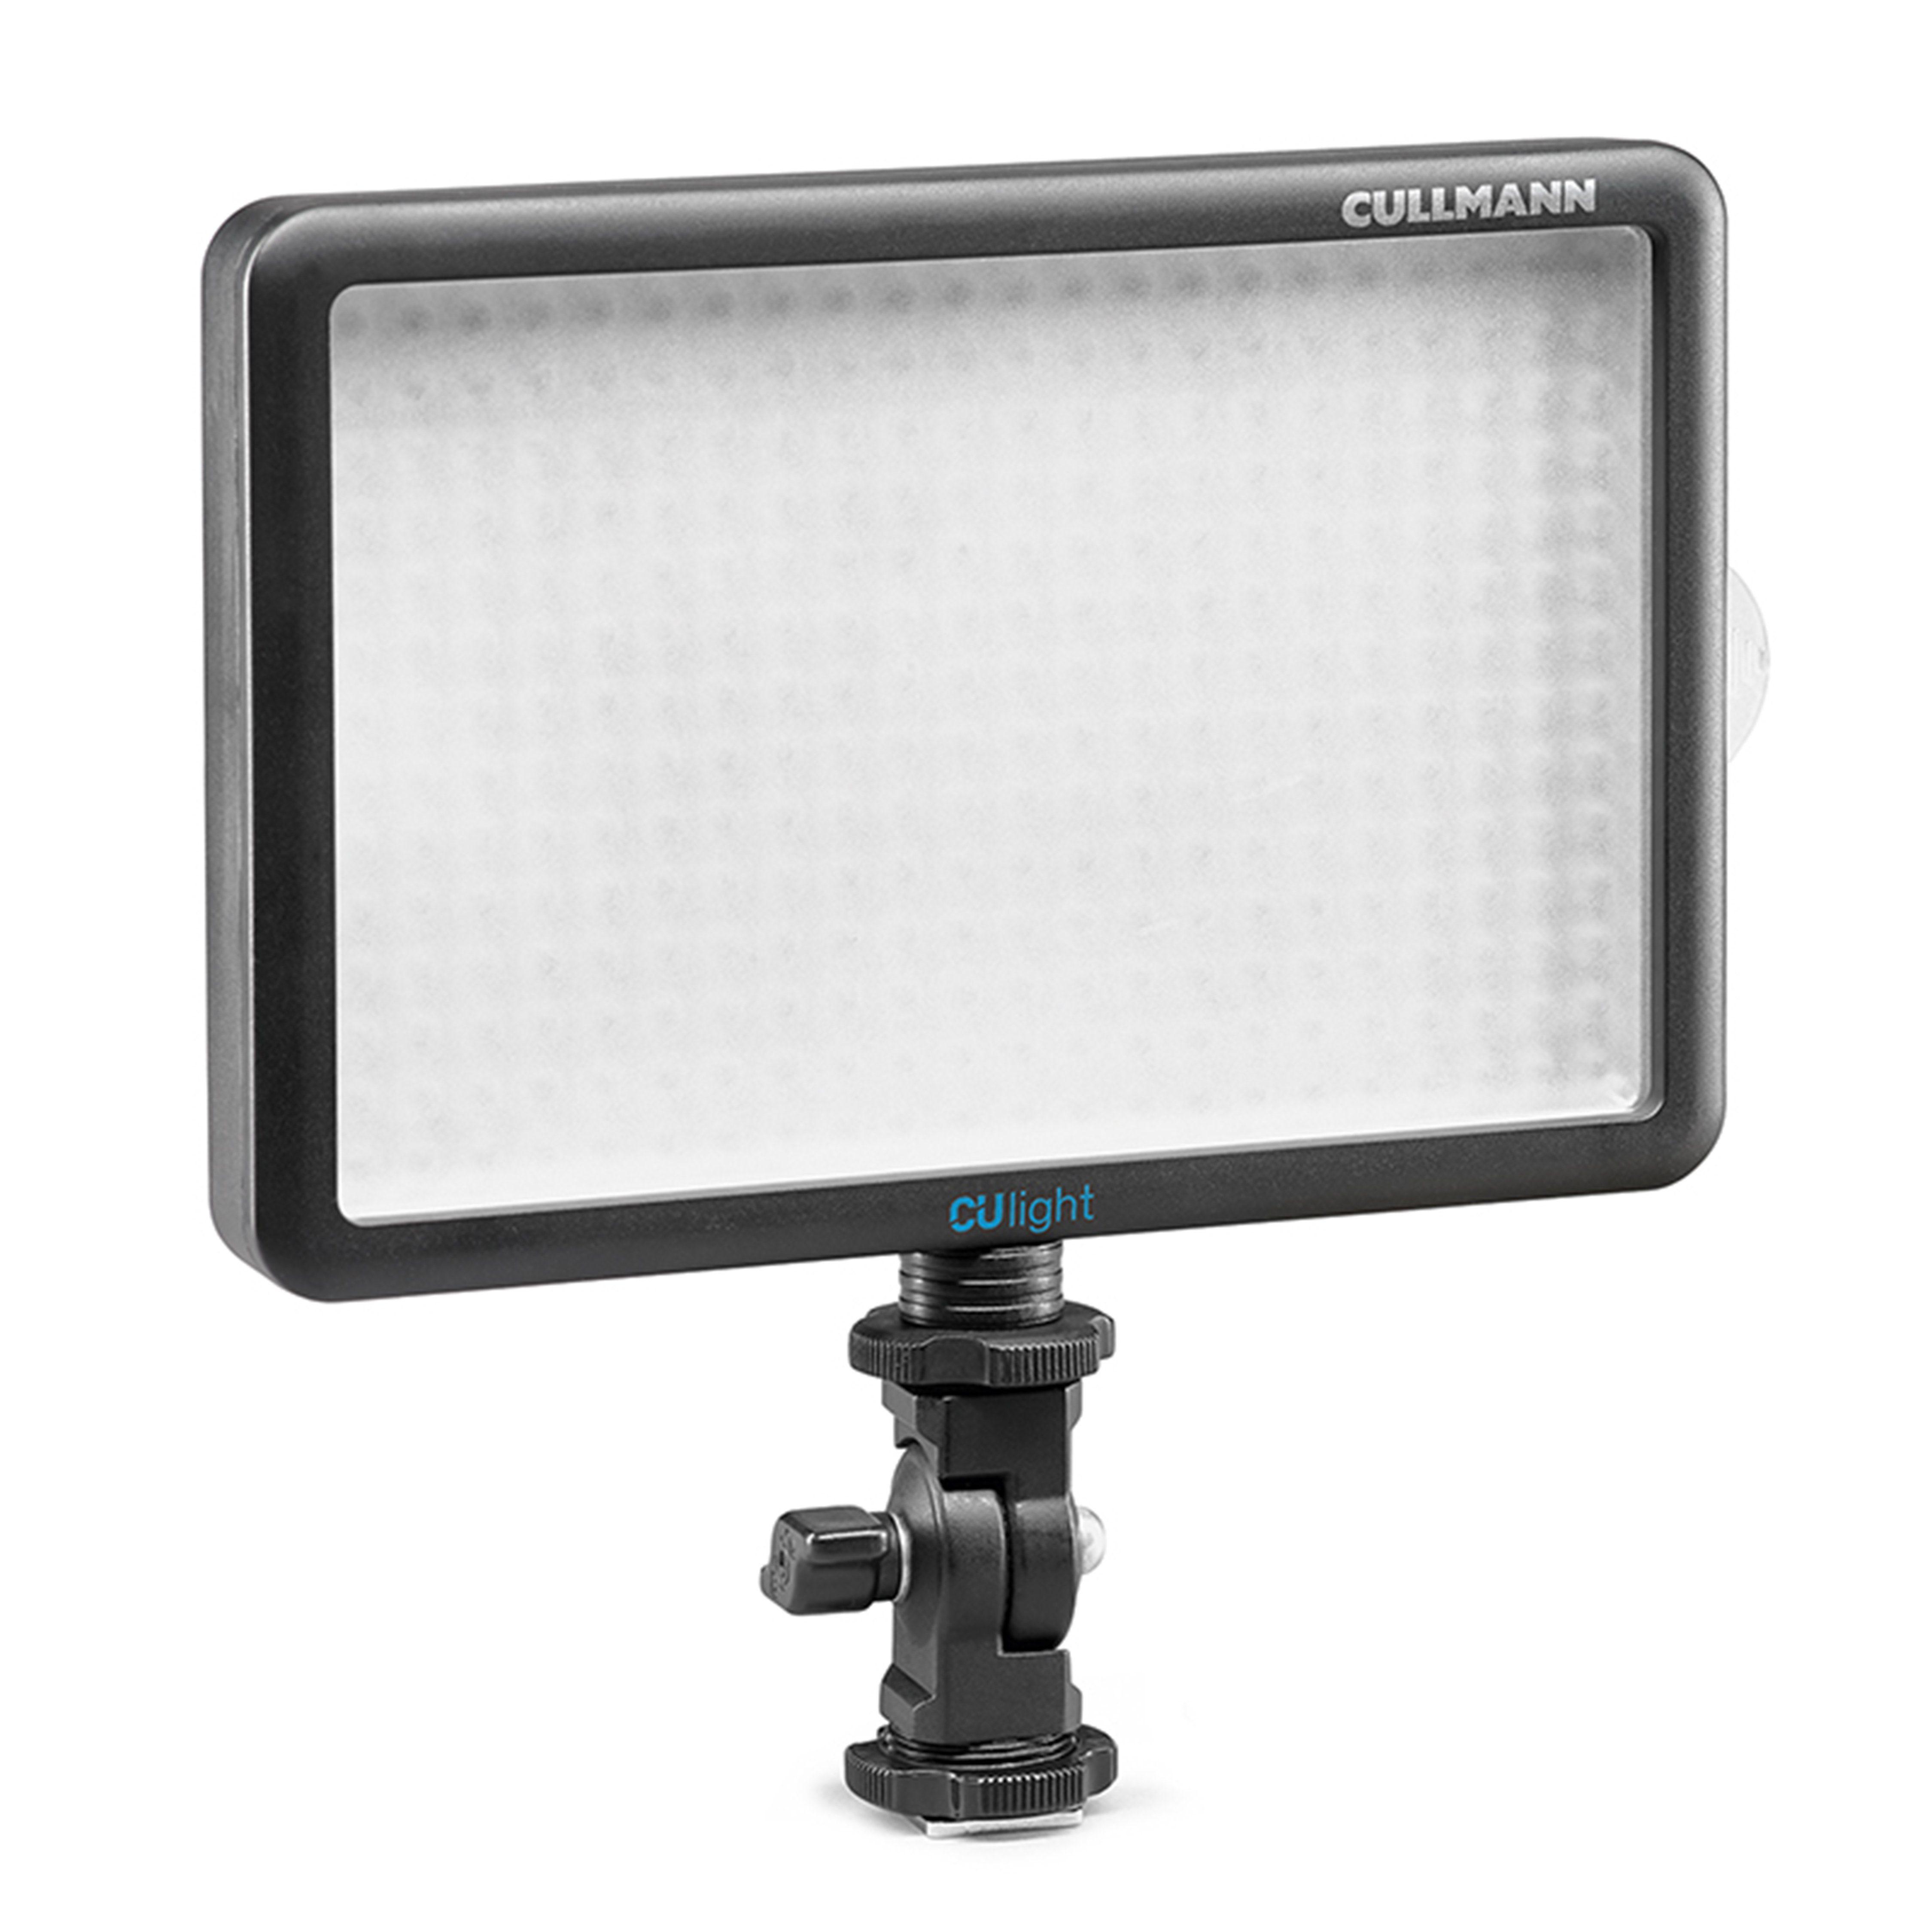 Cullmann LED-Videoleuchte, Bi-Colour, Diff.scheibe, 3.300-5.600 K »Culight VR 860BC«